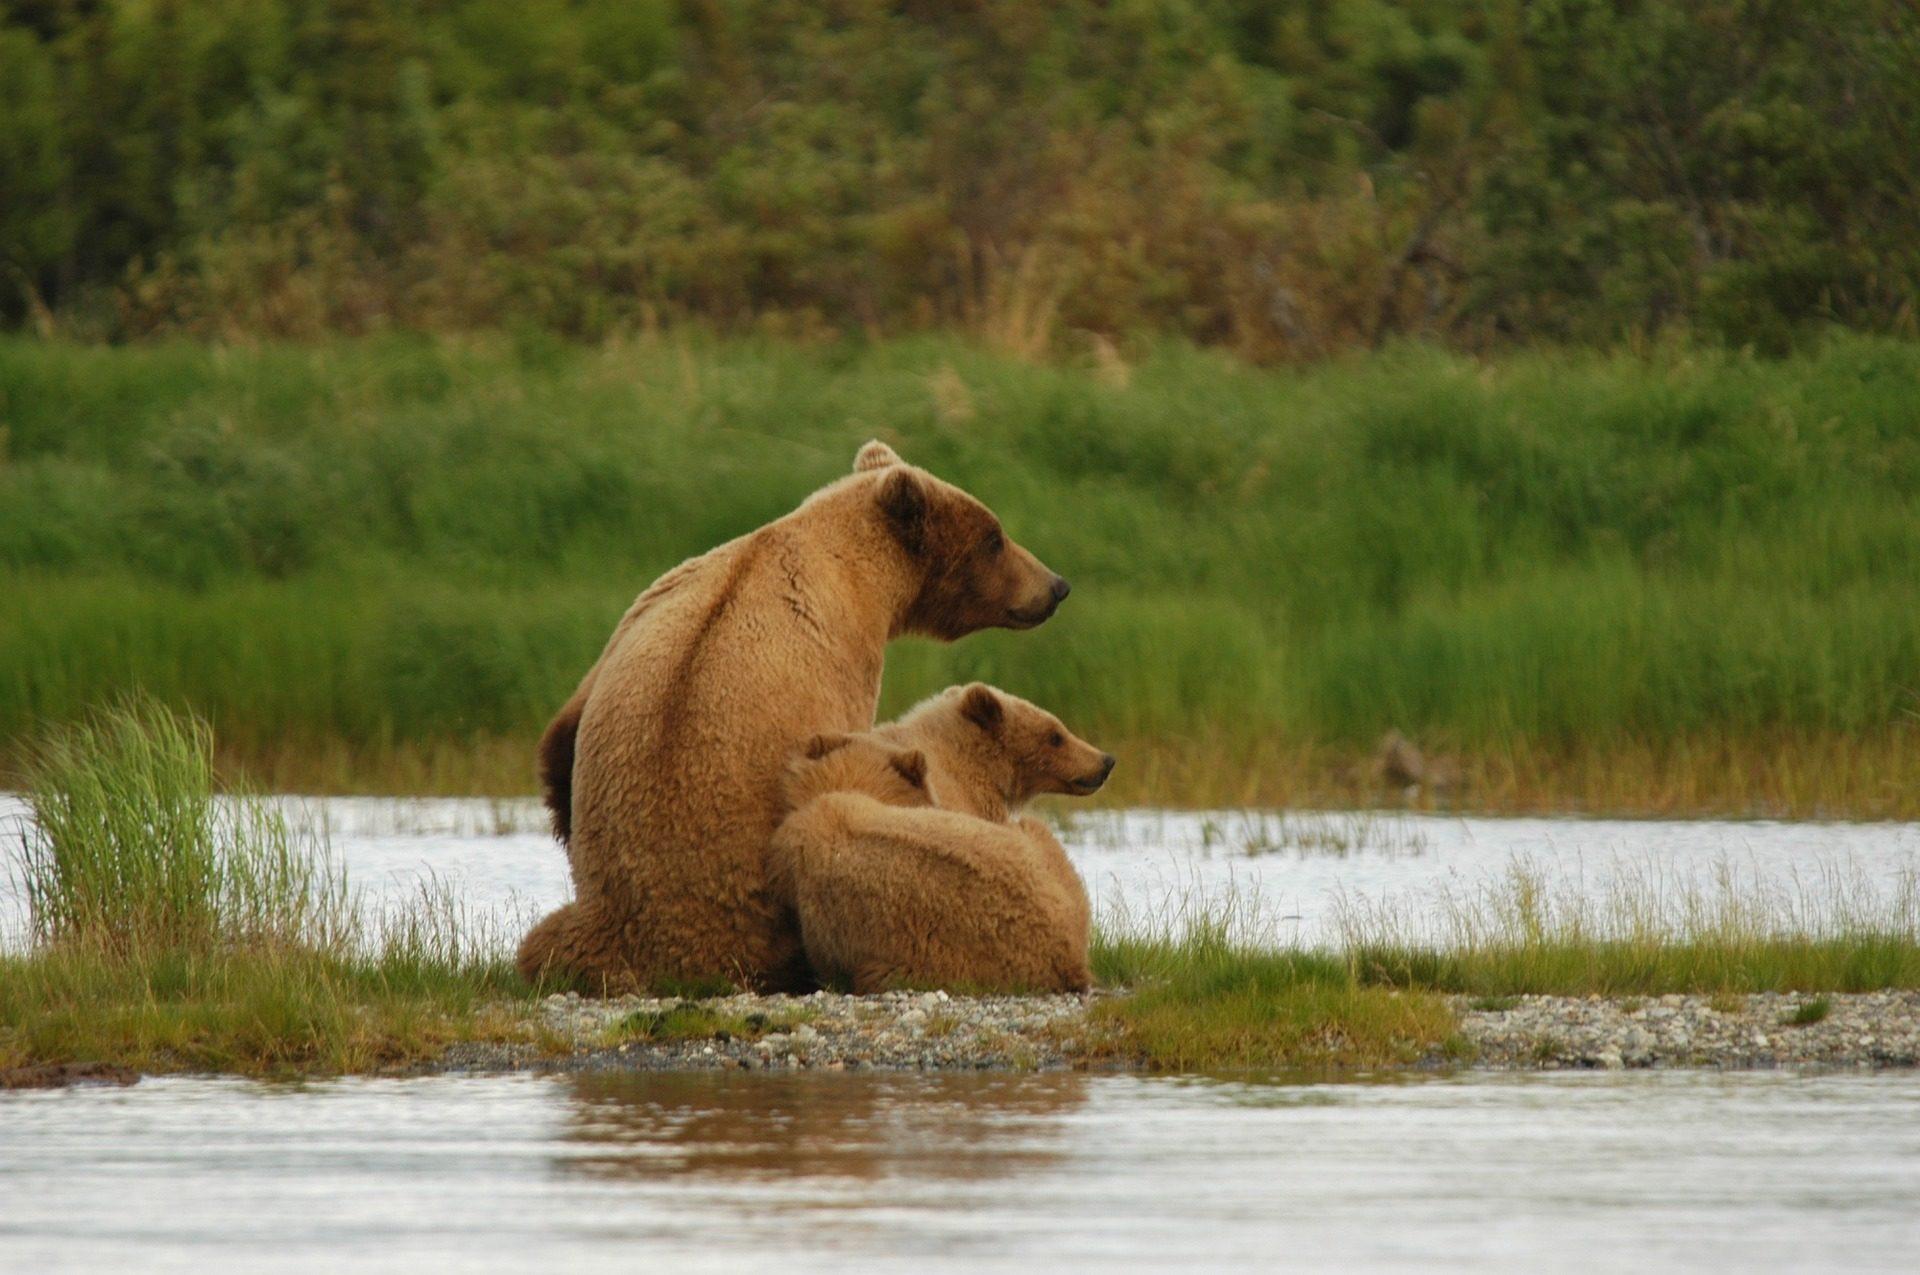 भालू, परिवार, नदी, जंगली, स्वतंत्रता - HD वॉलपेपर - प्रोफेसर-falken.com